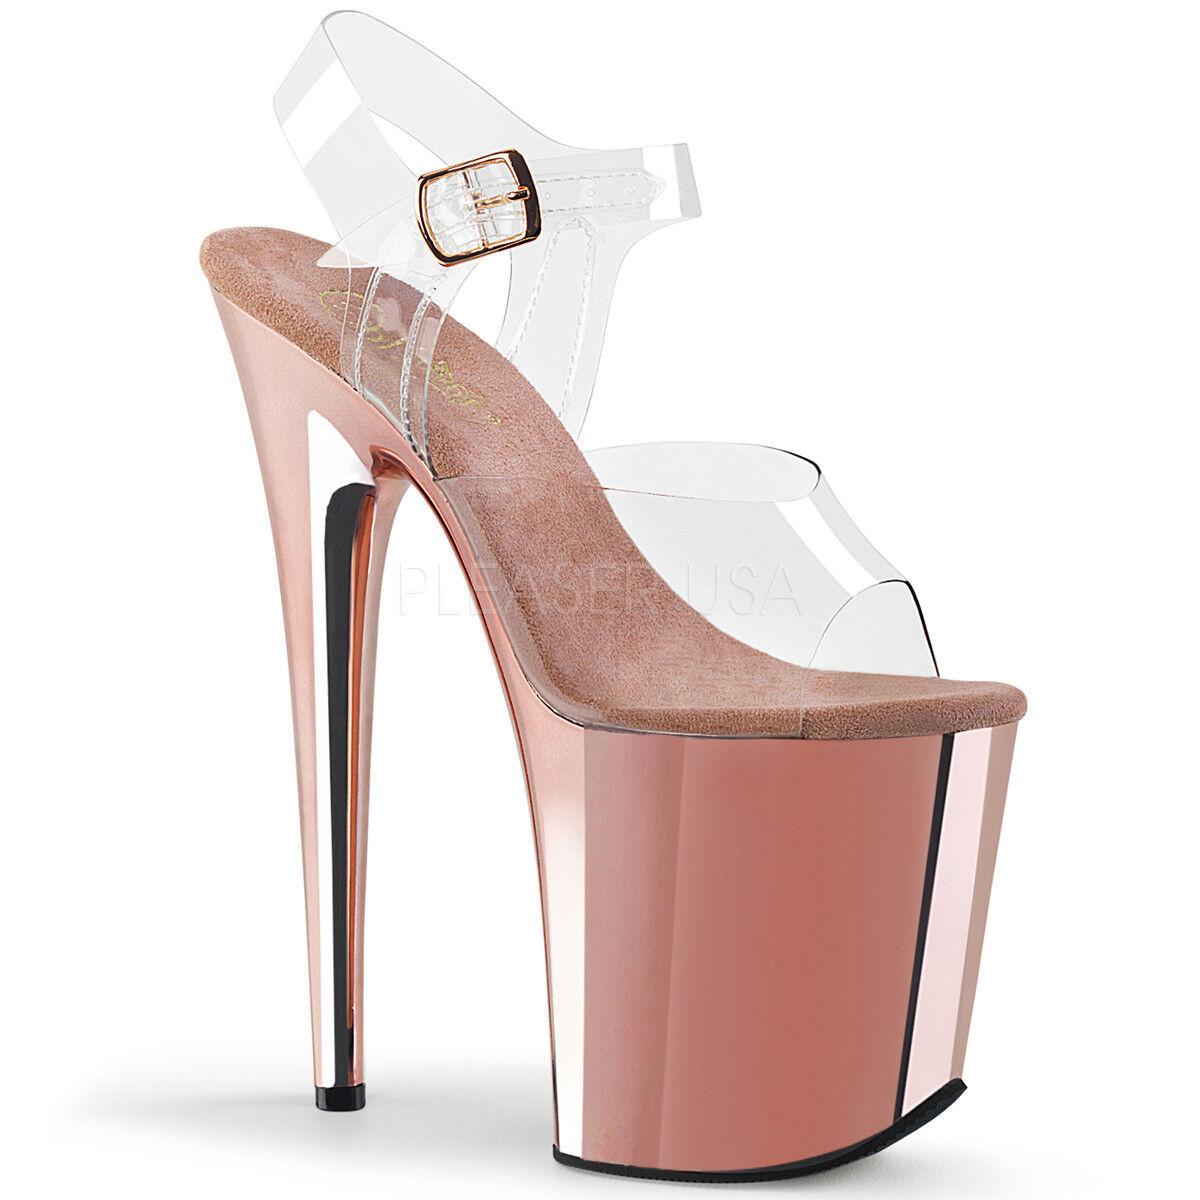 8    Clear Black Jumbo Stacked Platform Stripper Heels Pole Dancer shoes 5 6 7 8 9 86be8d